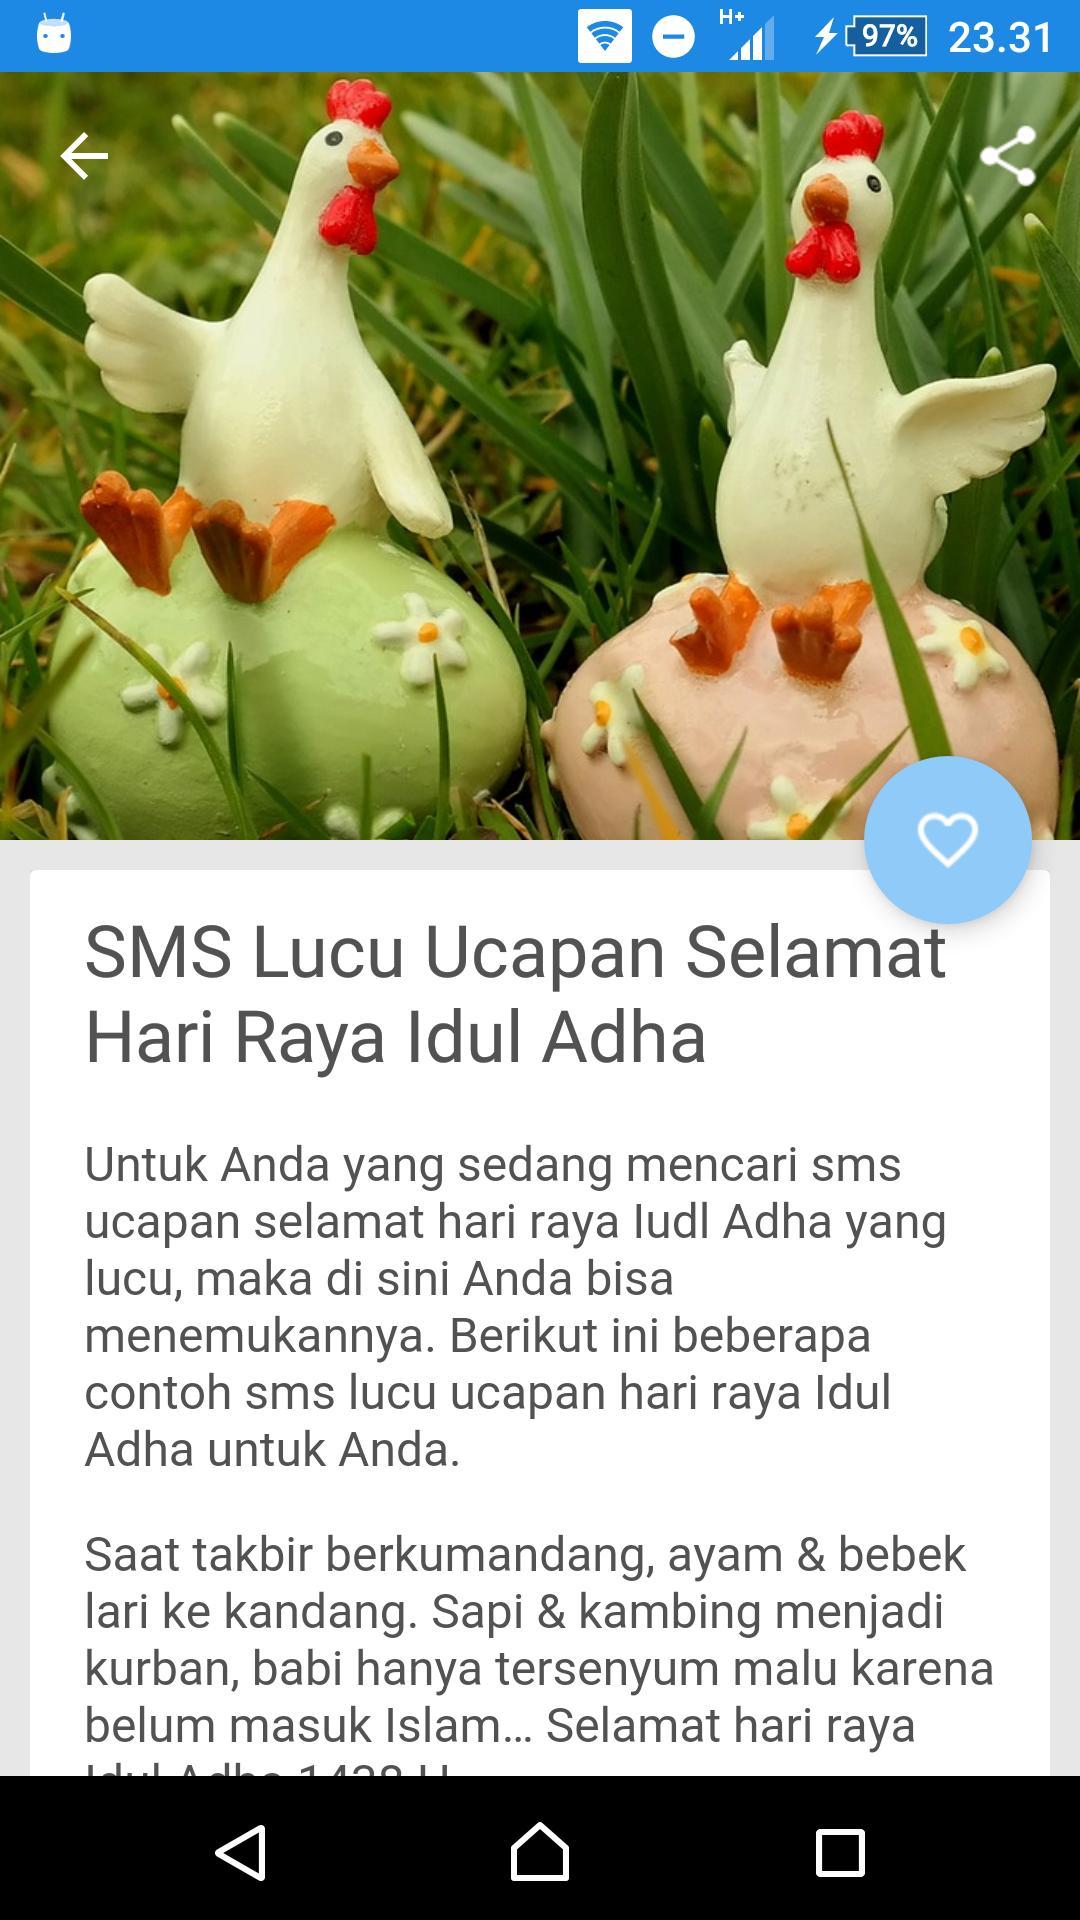 Ucapan Idul Adha 2017 For Android APK Download